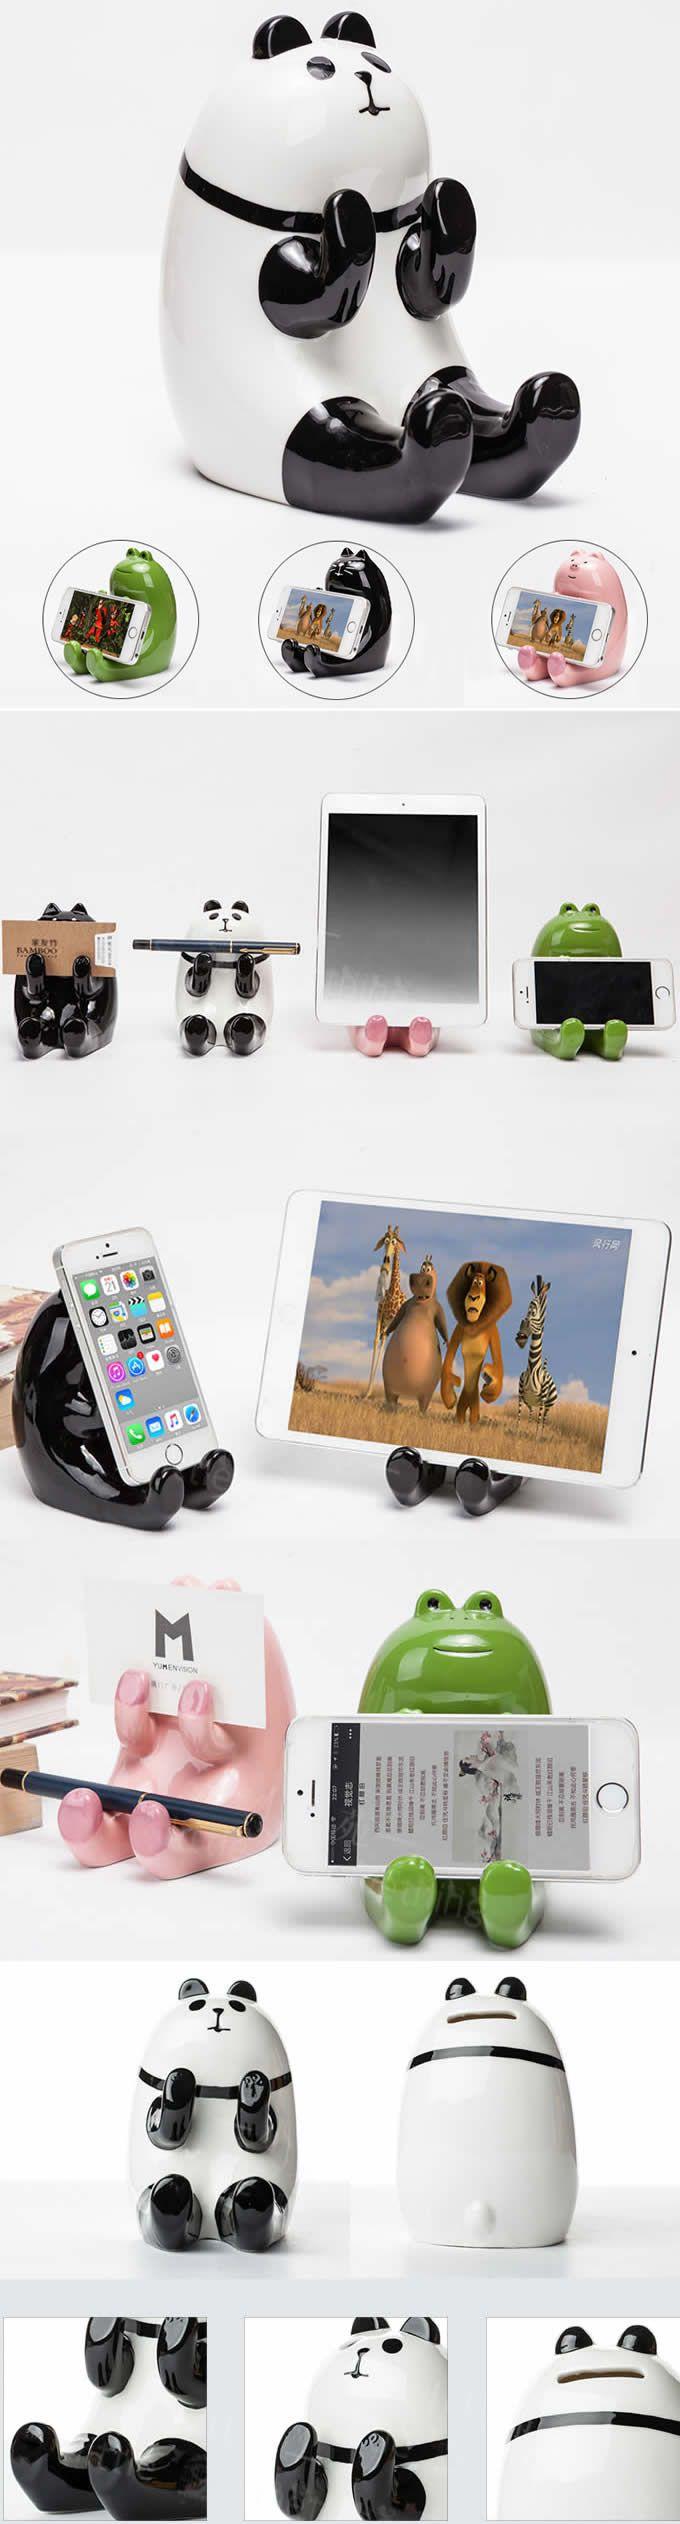 Ceramic Panda Piggy Bank Cell Phone Stand Holder